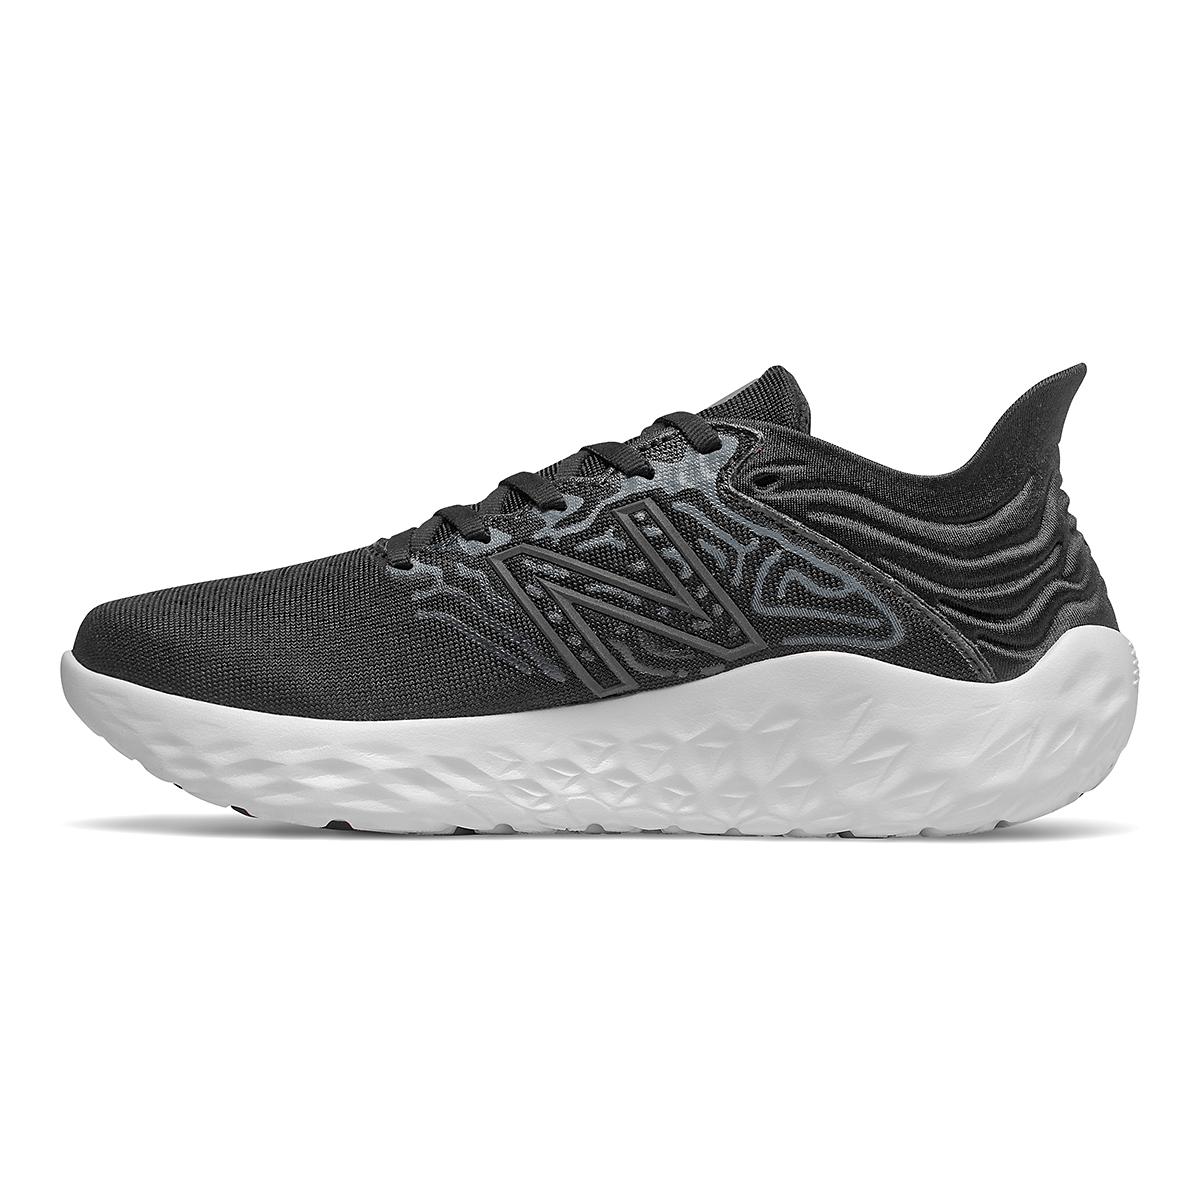 Women's New Balance Beacon V3 Running Shoe - Color: Black - Size: 6.5 - Width: Regular, Black, large, image 2